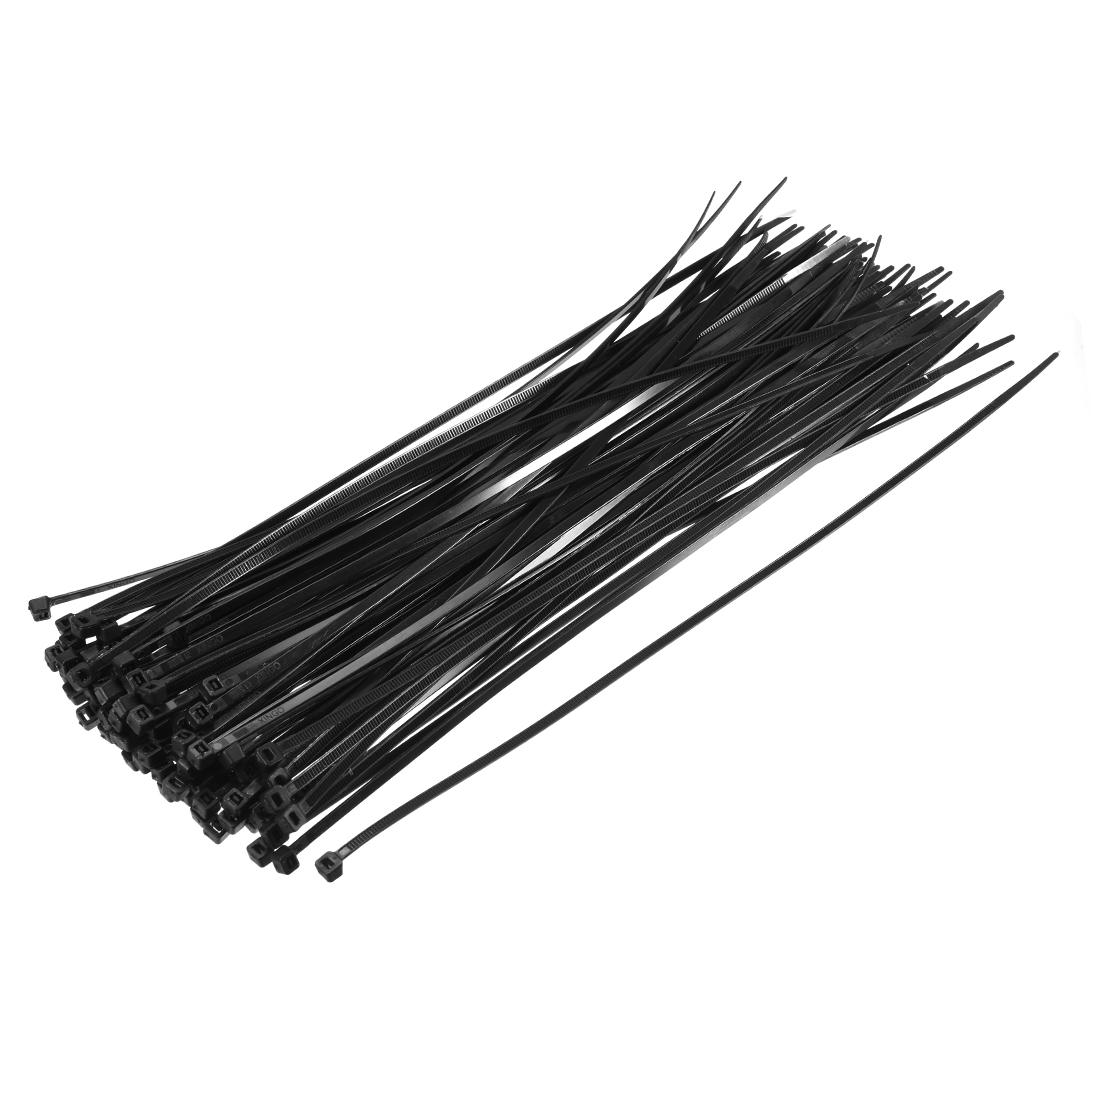 Cable Zip Ties 300mmx3.6mm Self-Locking Nylon Tie Wraps Black 250pcs